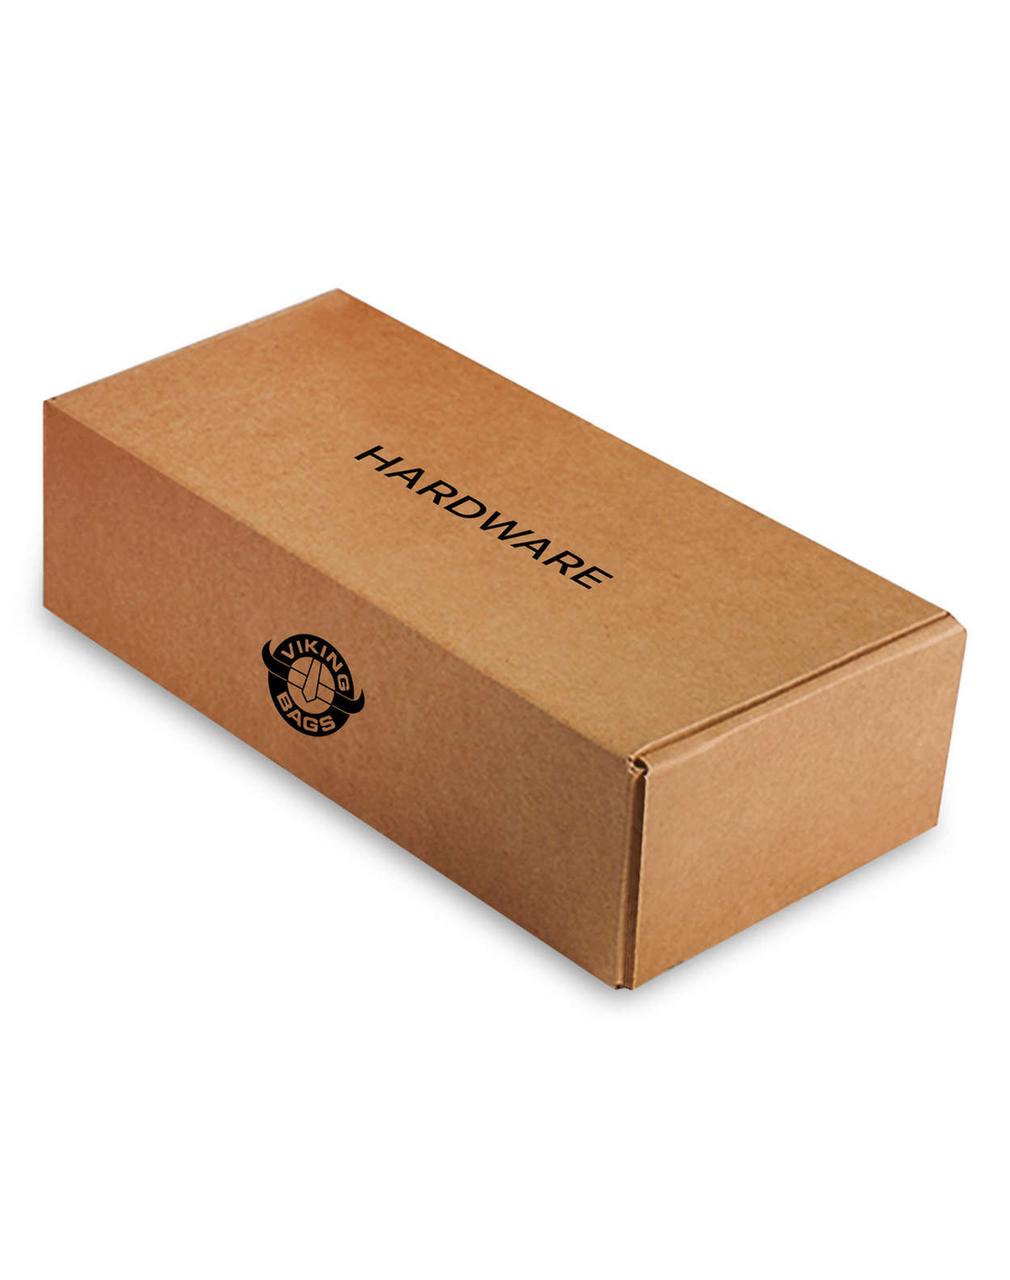 Honda 750 Shadow Aero Viking Pinnacle Leather Motorcycle Saddlebags Hardware Box